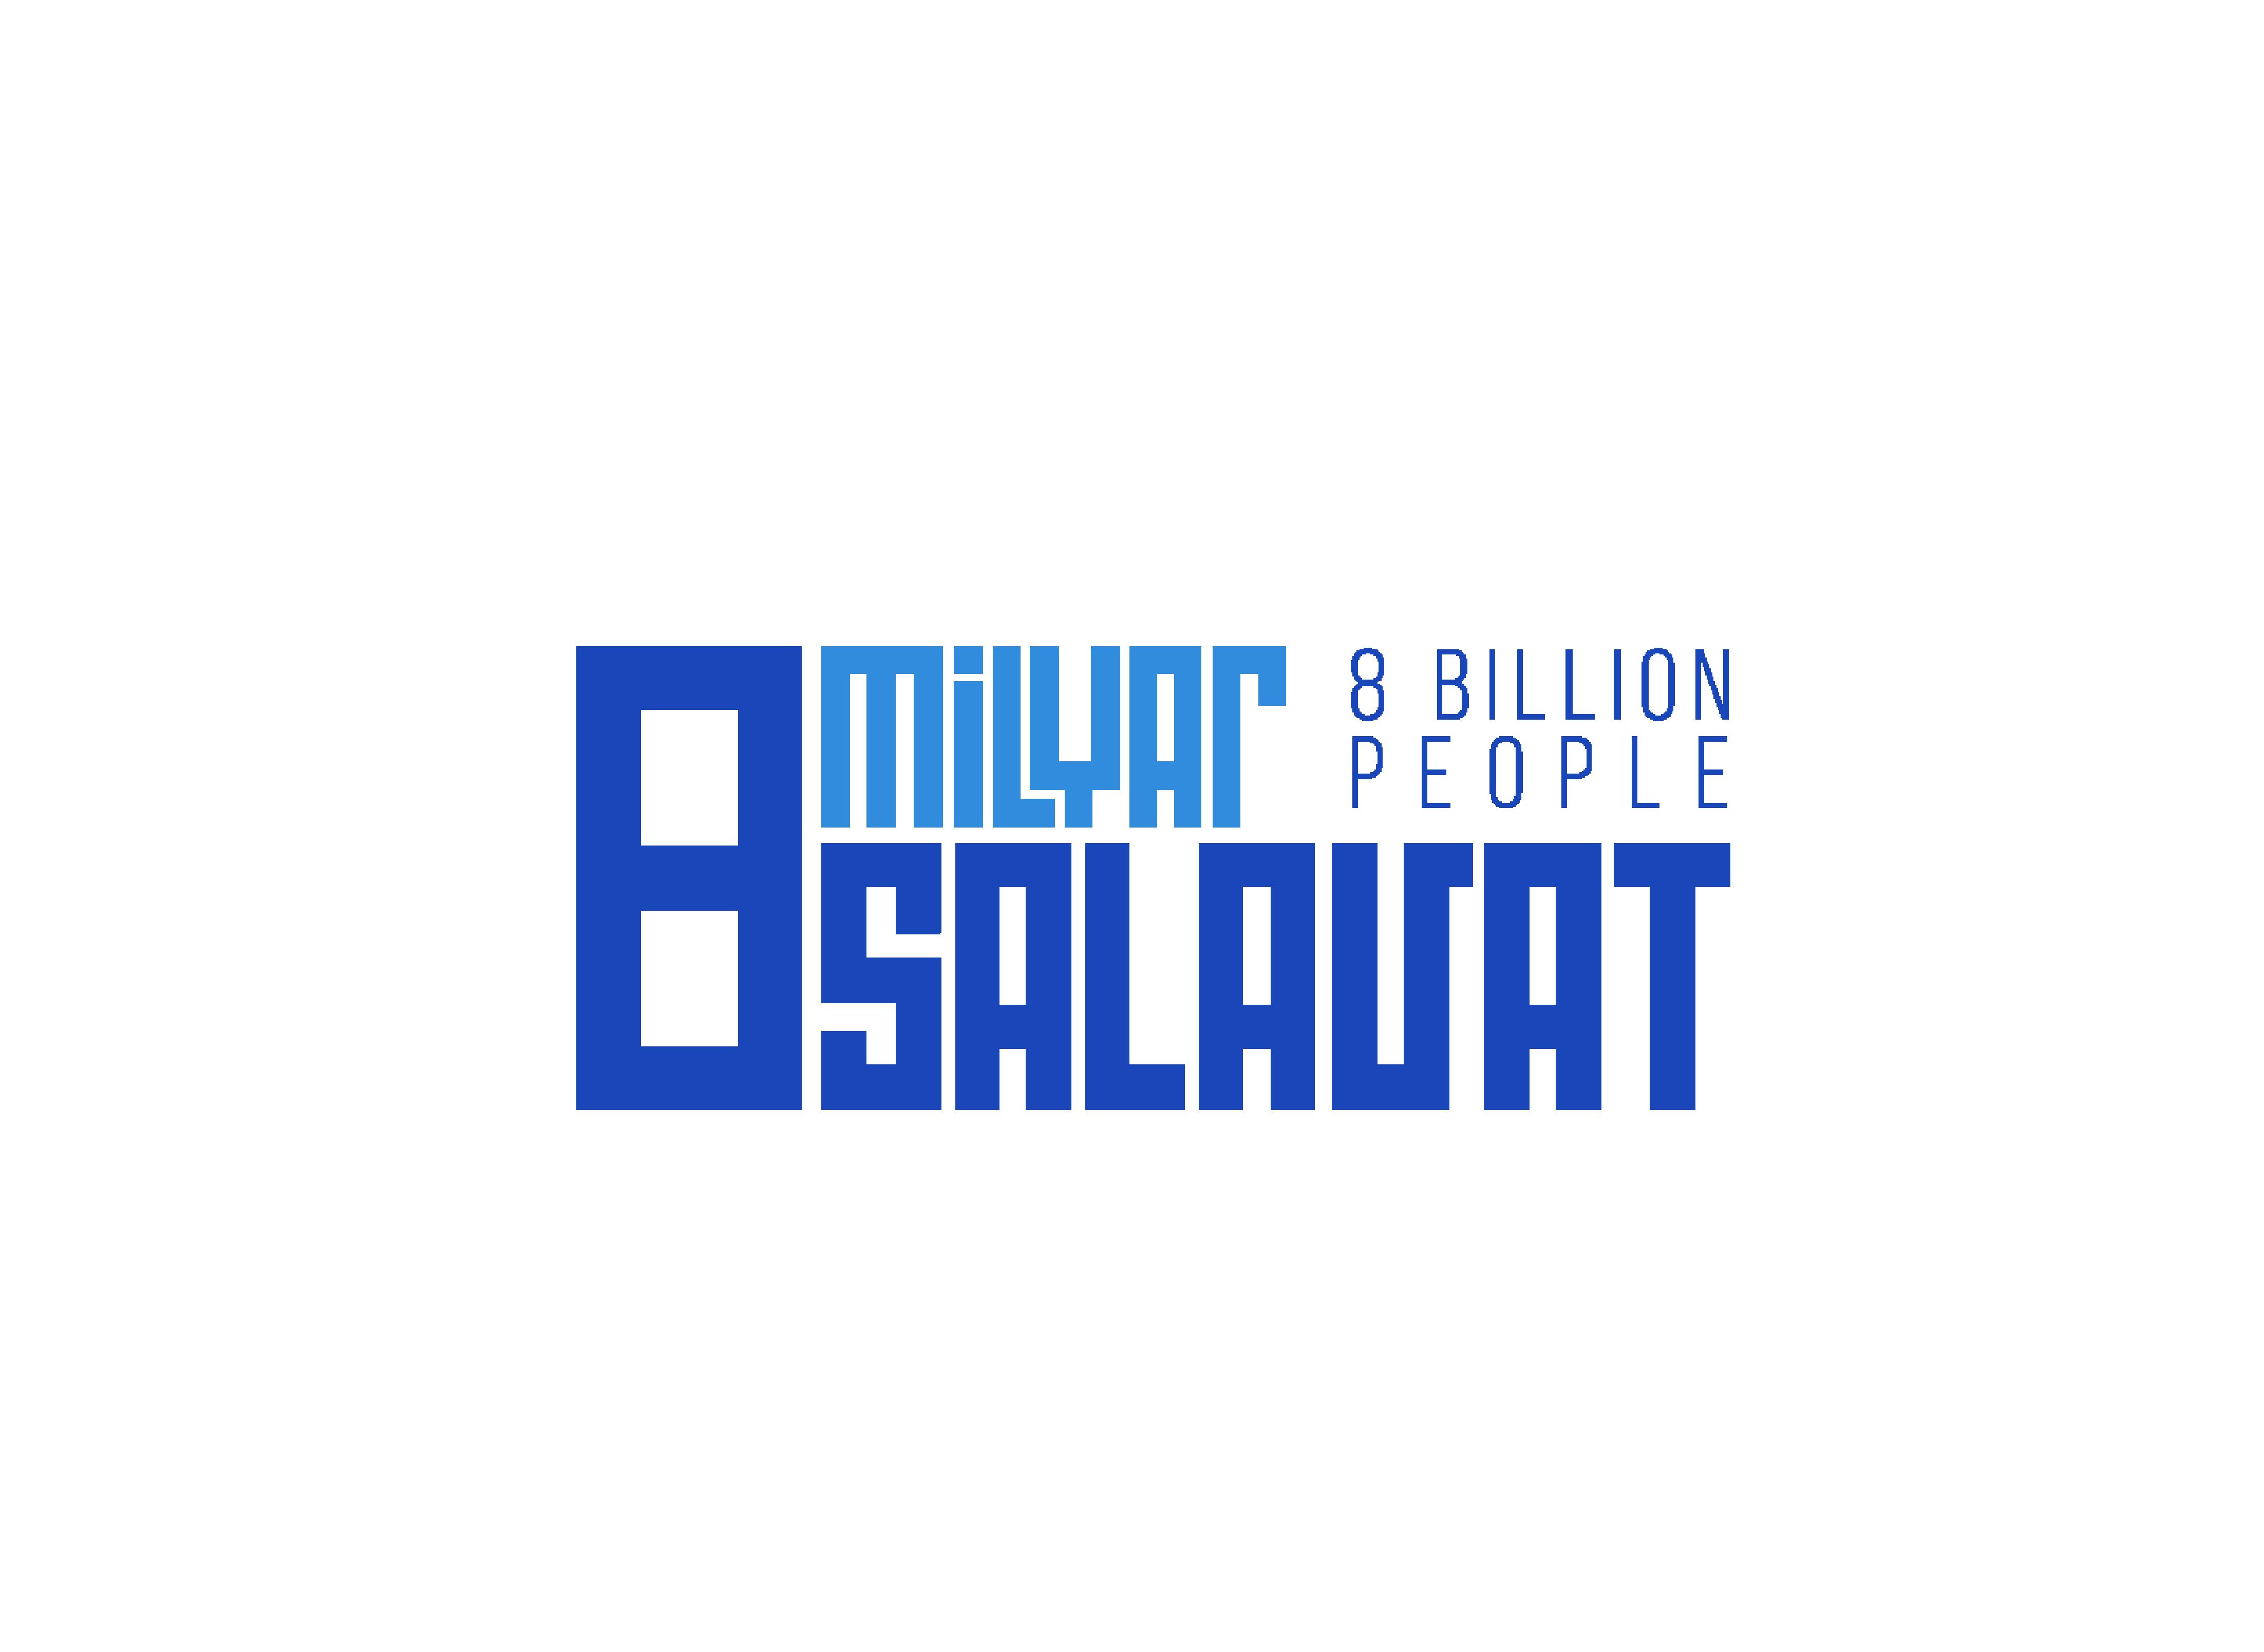 8 Milyar Salavat